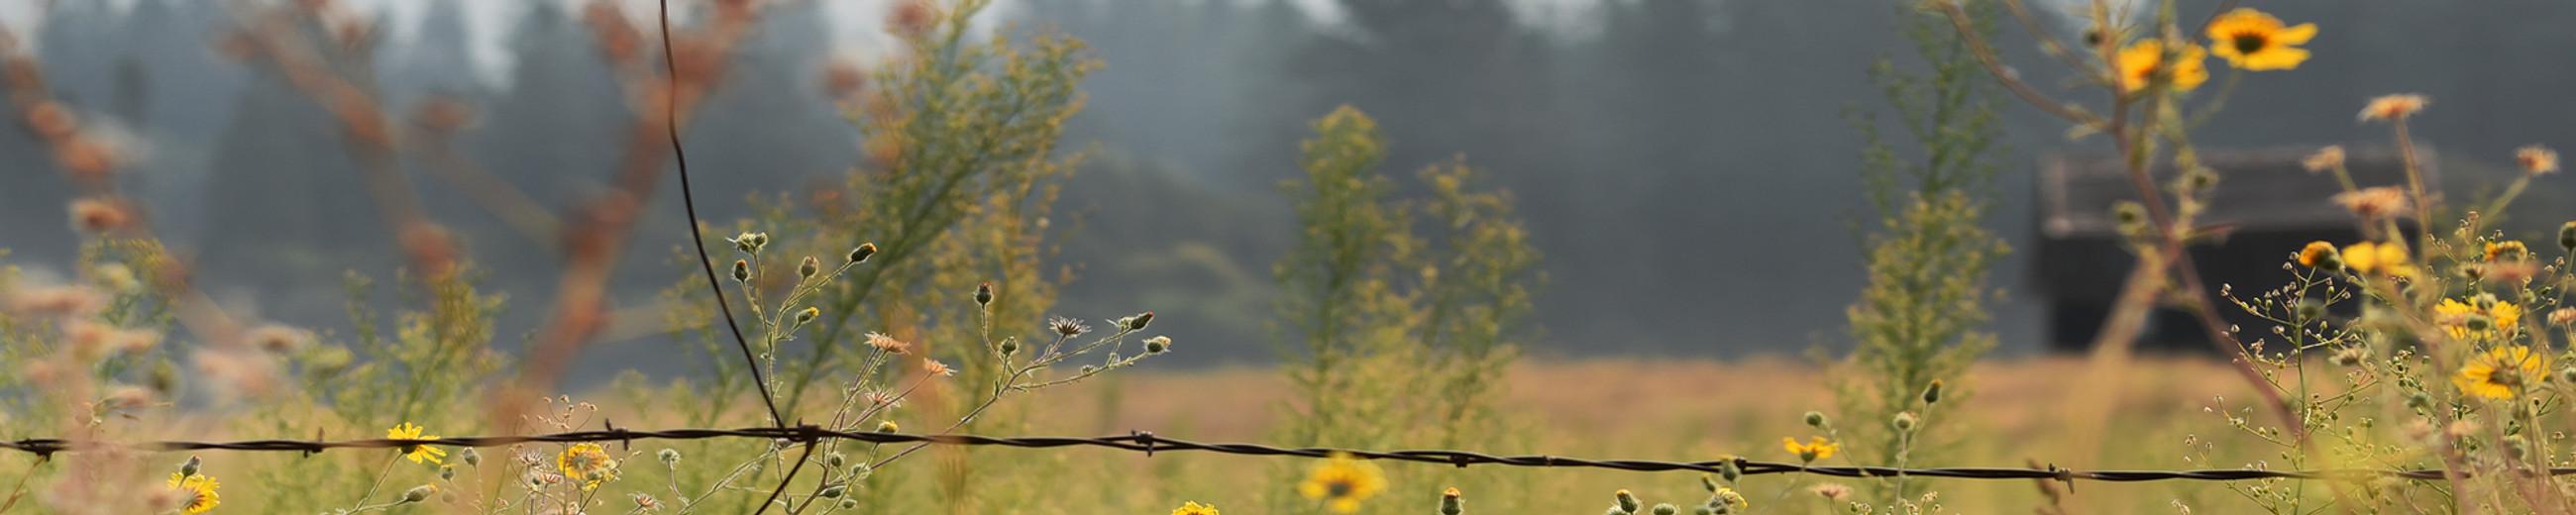 barbwire meadow slice.jpg